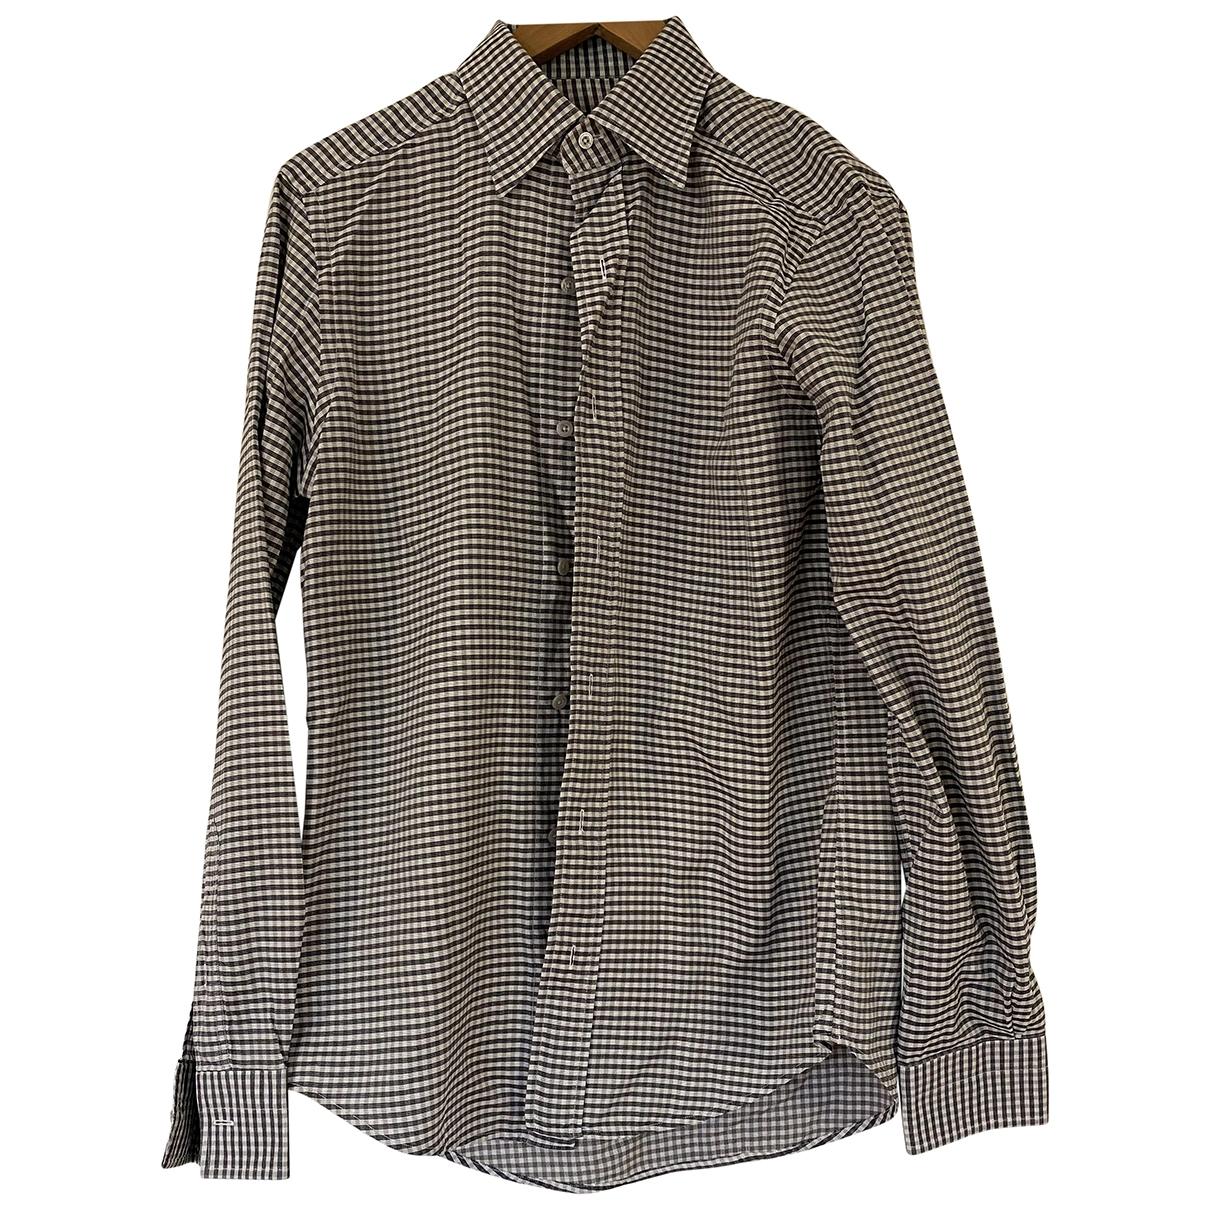 Tom Ford \N Grey Cotton Shirts for Men 39 EU (tour de cou / collar)